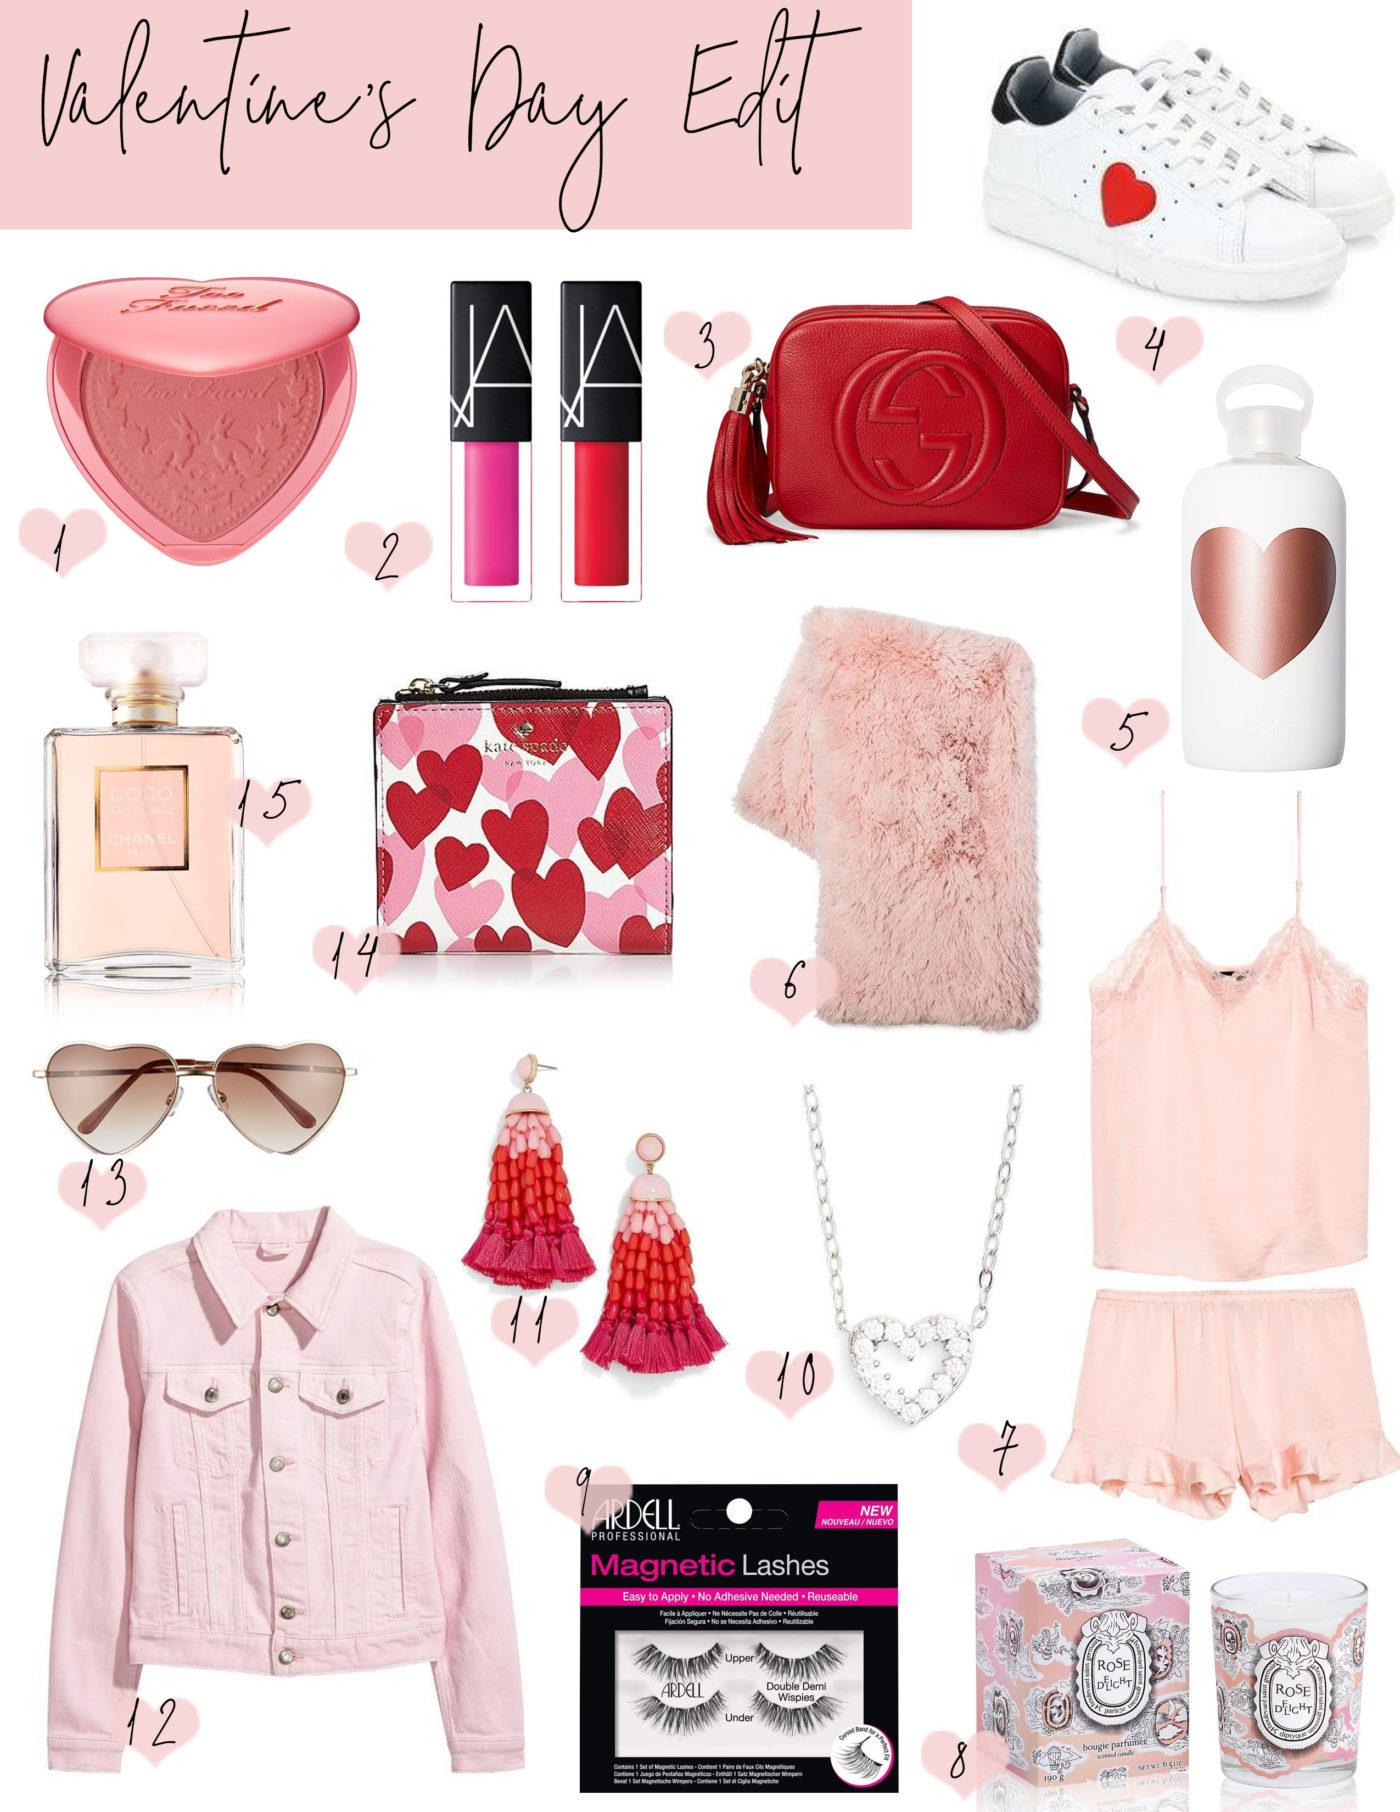 Valentines Day Edit- Valentine's Day Gift Guide